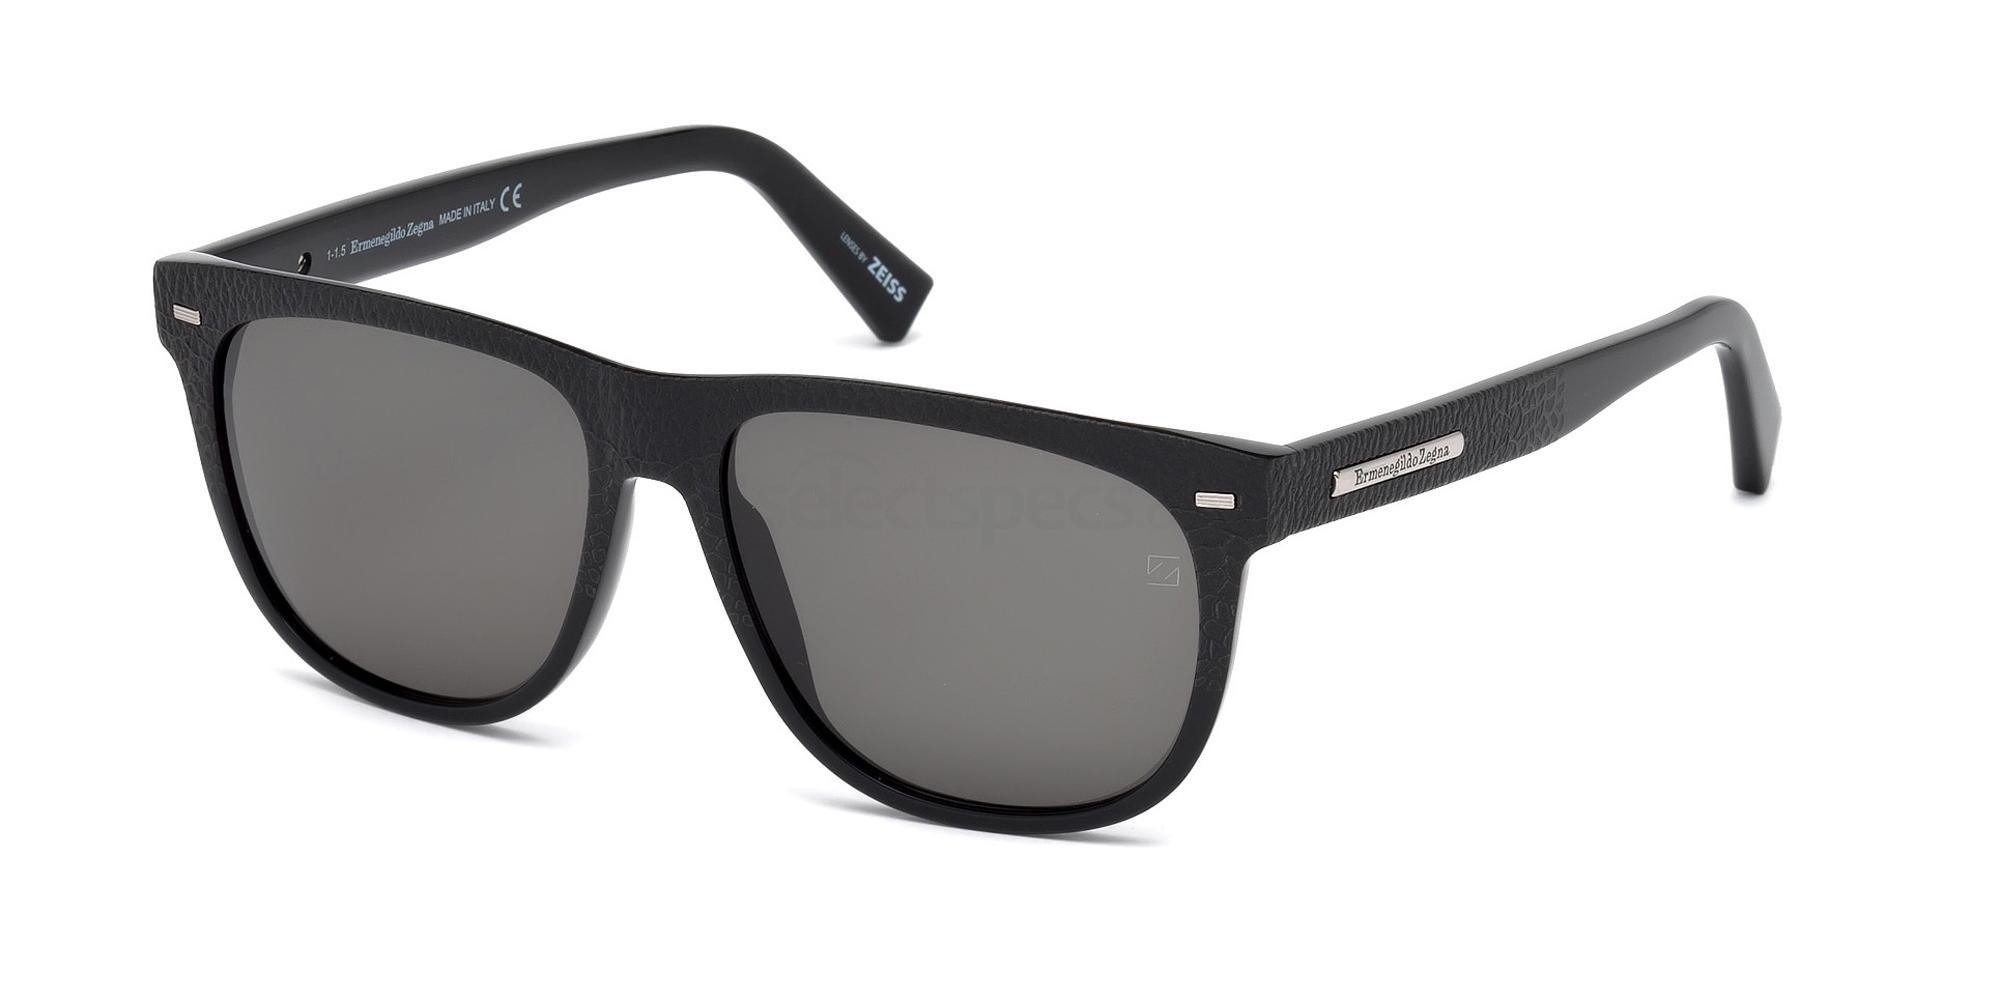 01A EZ0034 Sunglasses, Ermenegildo Zegna